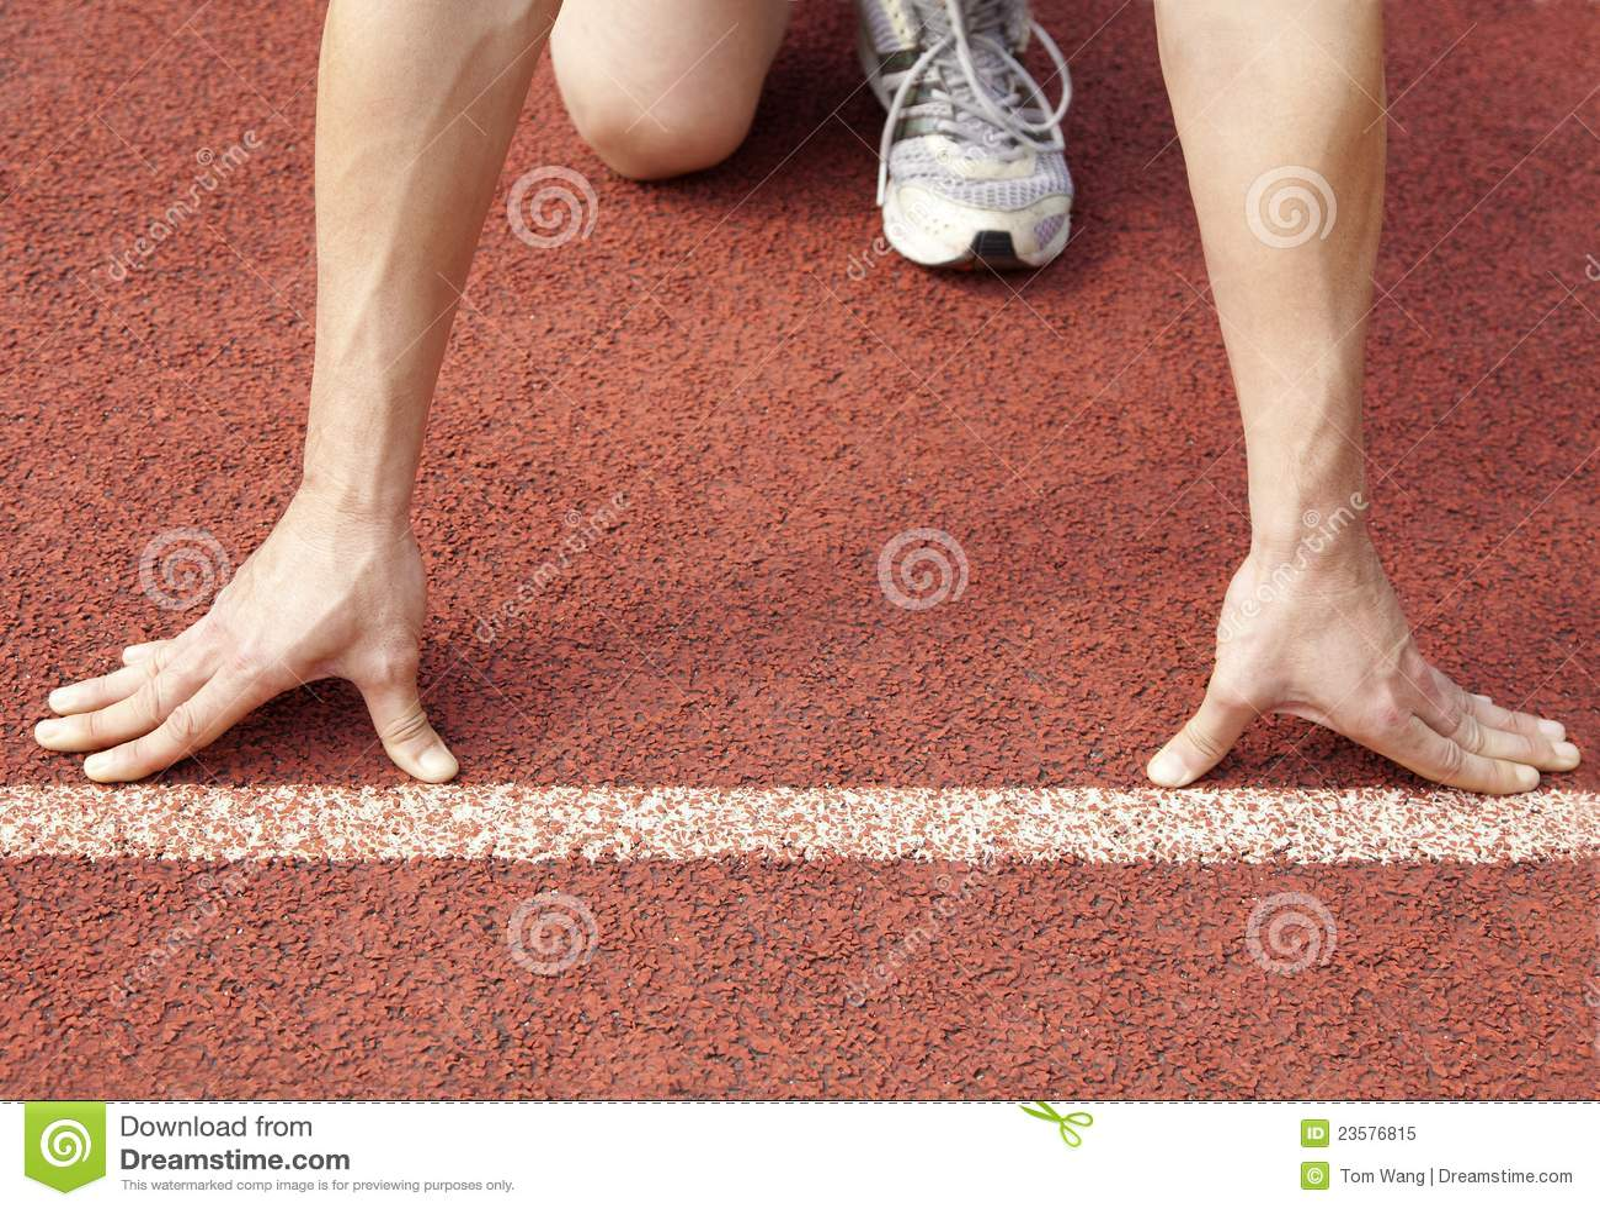 Athlete Start Of A Race Stock Image  Image Of Runner